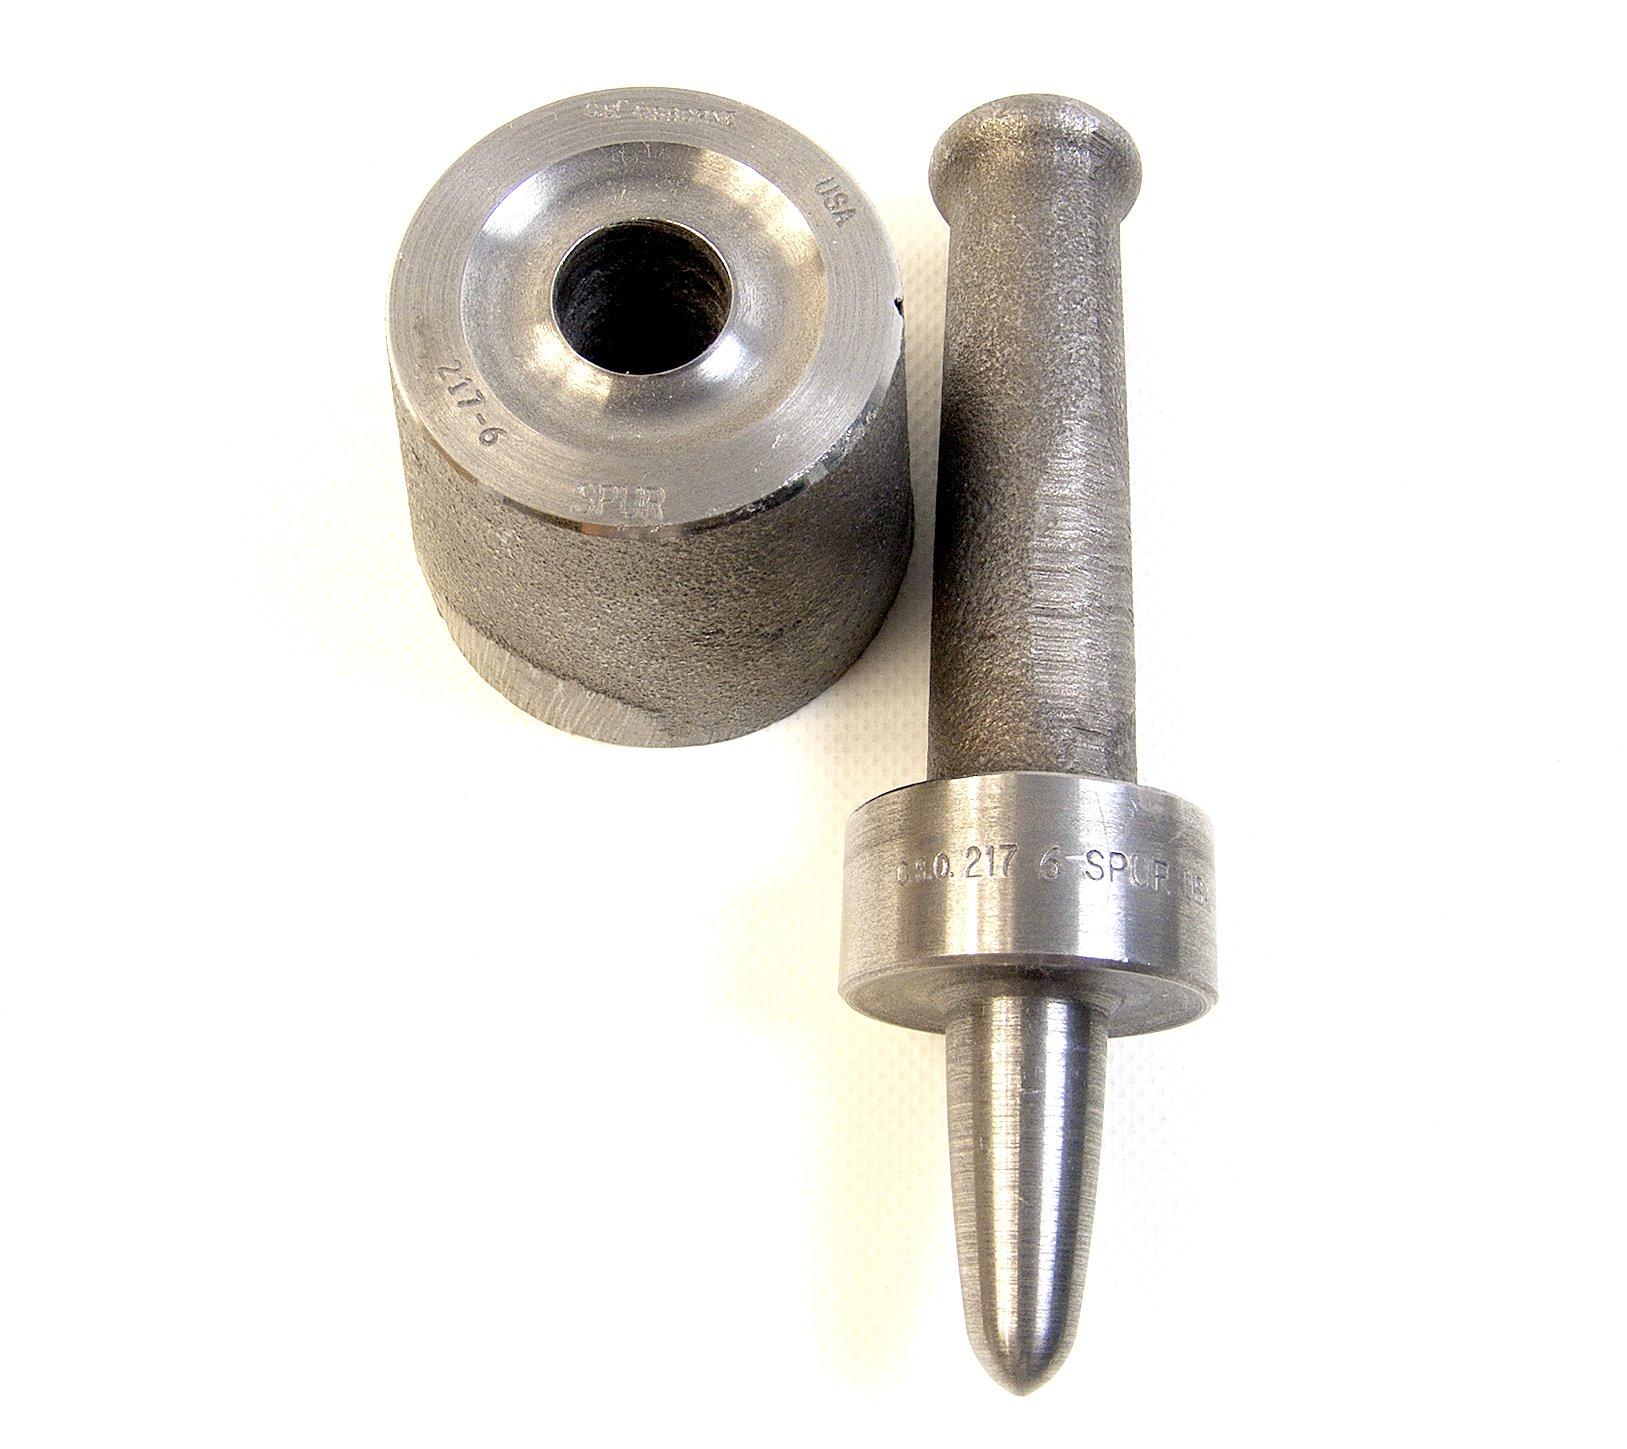 Grommet Setting Tool, C.S. Osborne #6 Rolled Rim Spur, 217-6, 1 Each by C.S. Osborne 217-6 Setting Tool